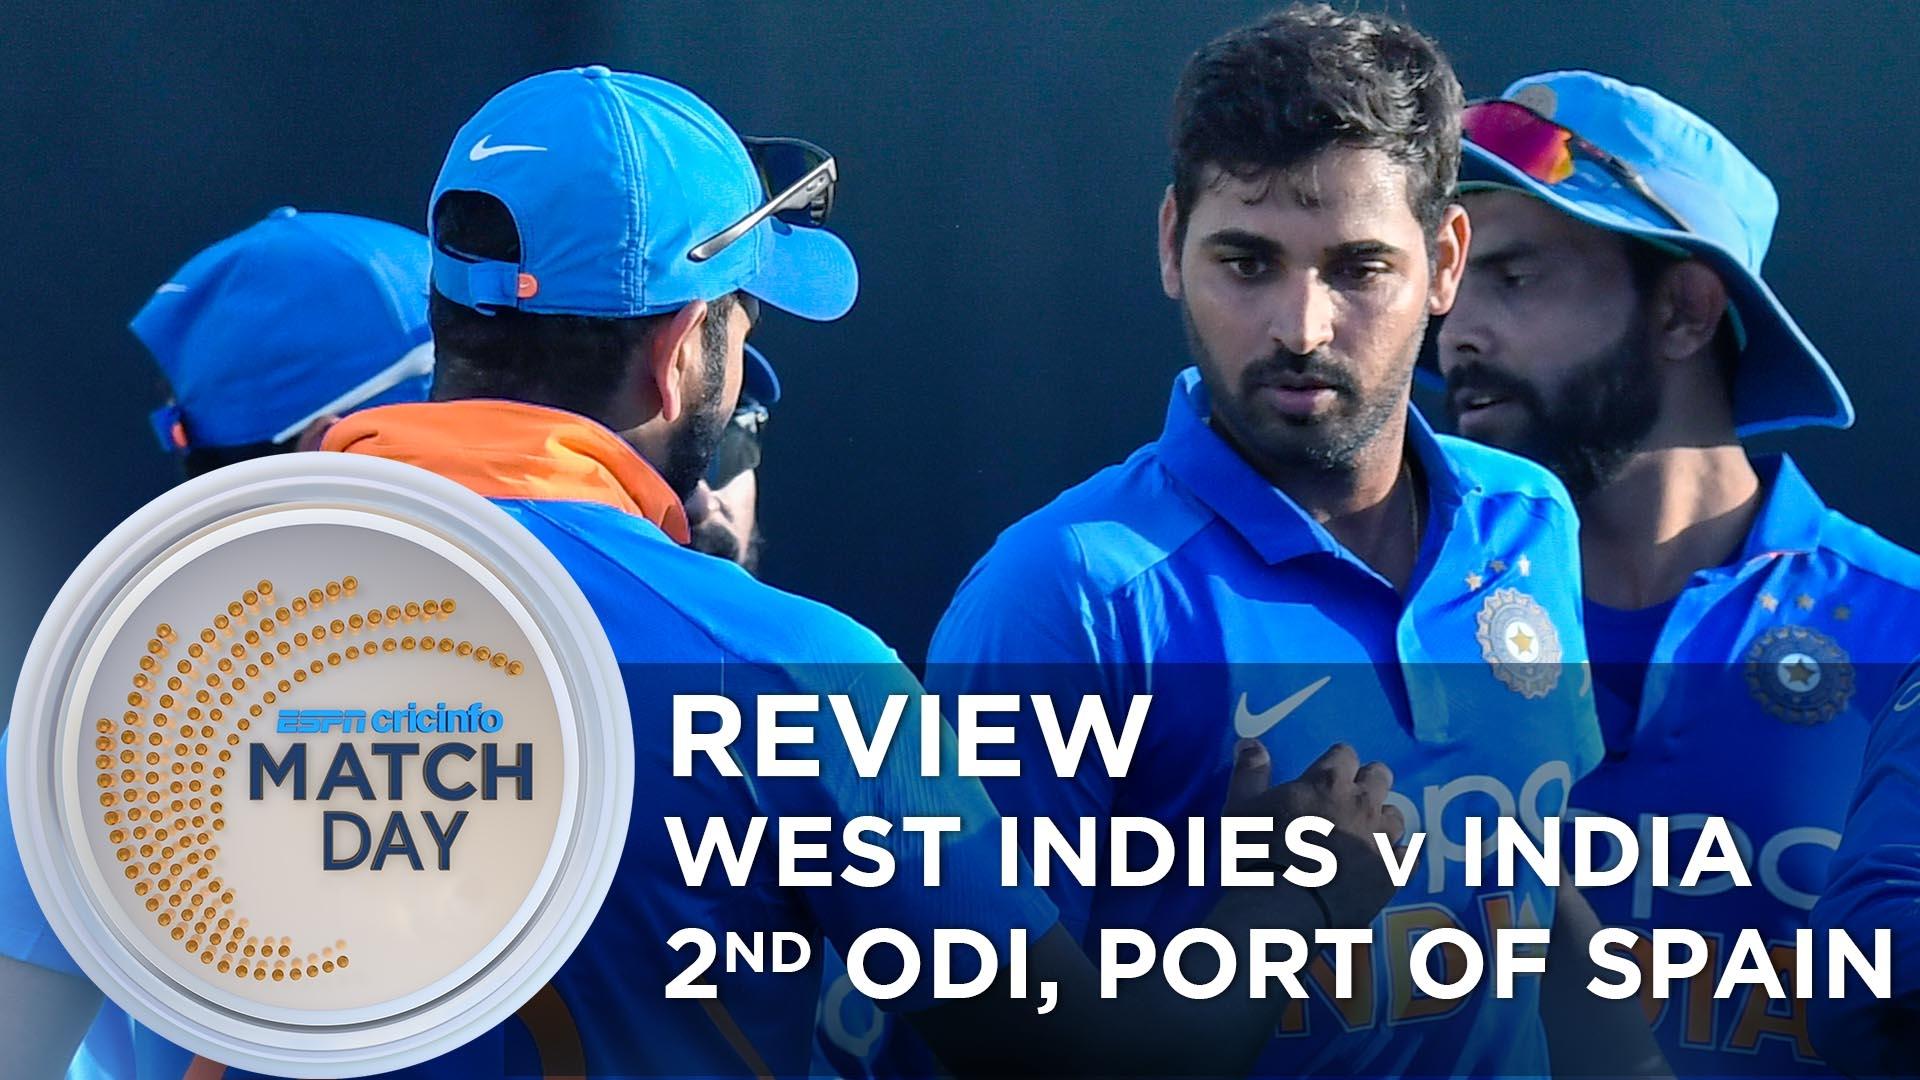 Full Scorecard Of West Indies Vs India 2nd Odi 2019 Score